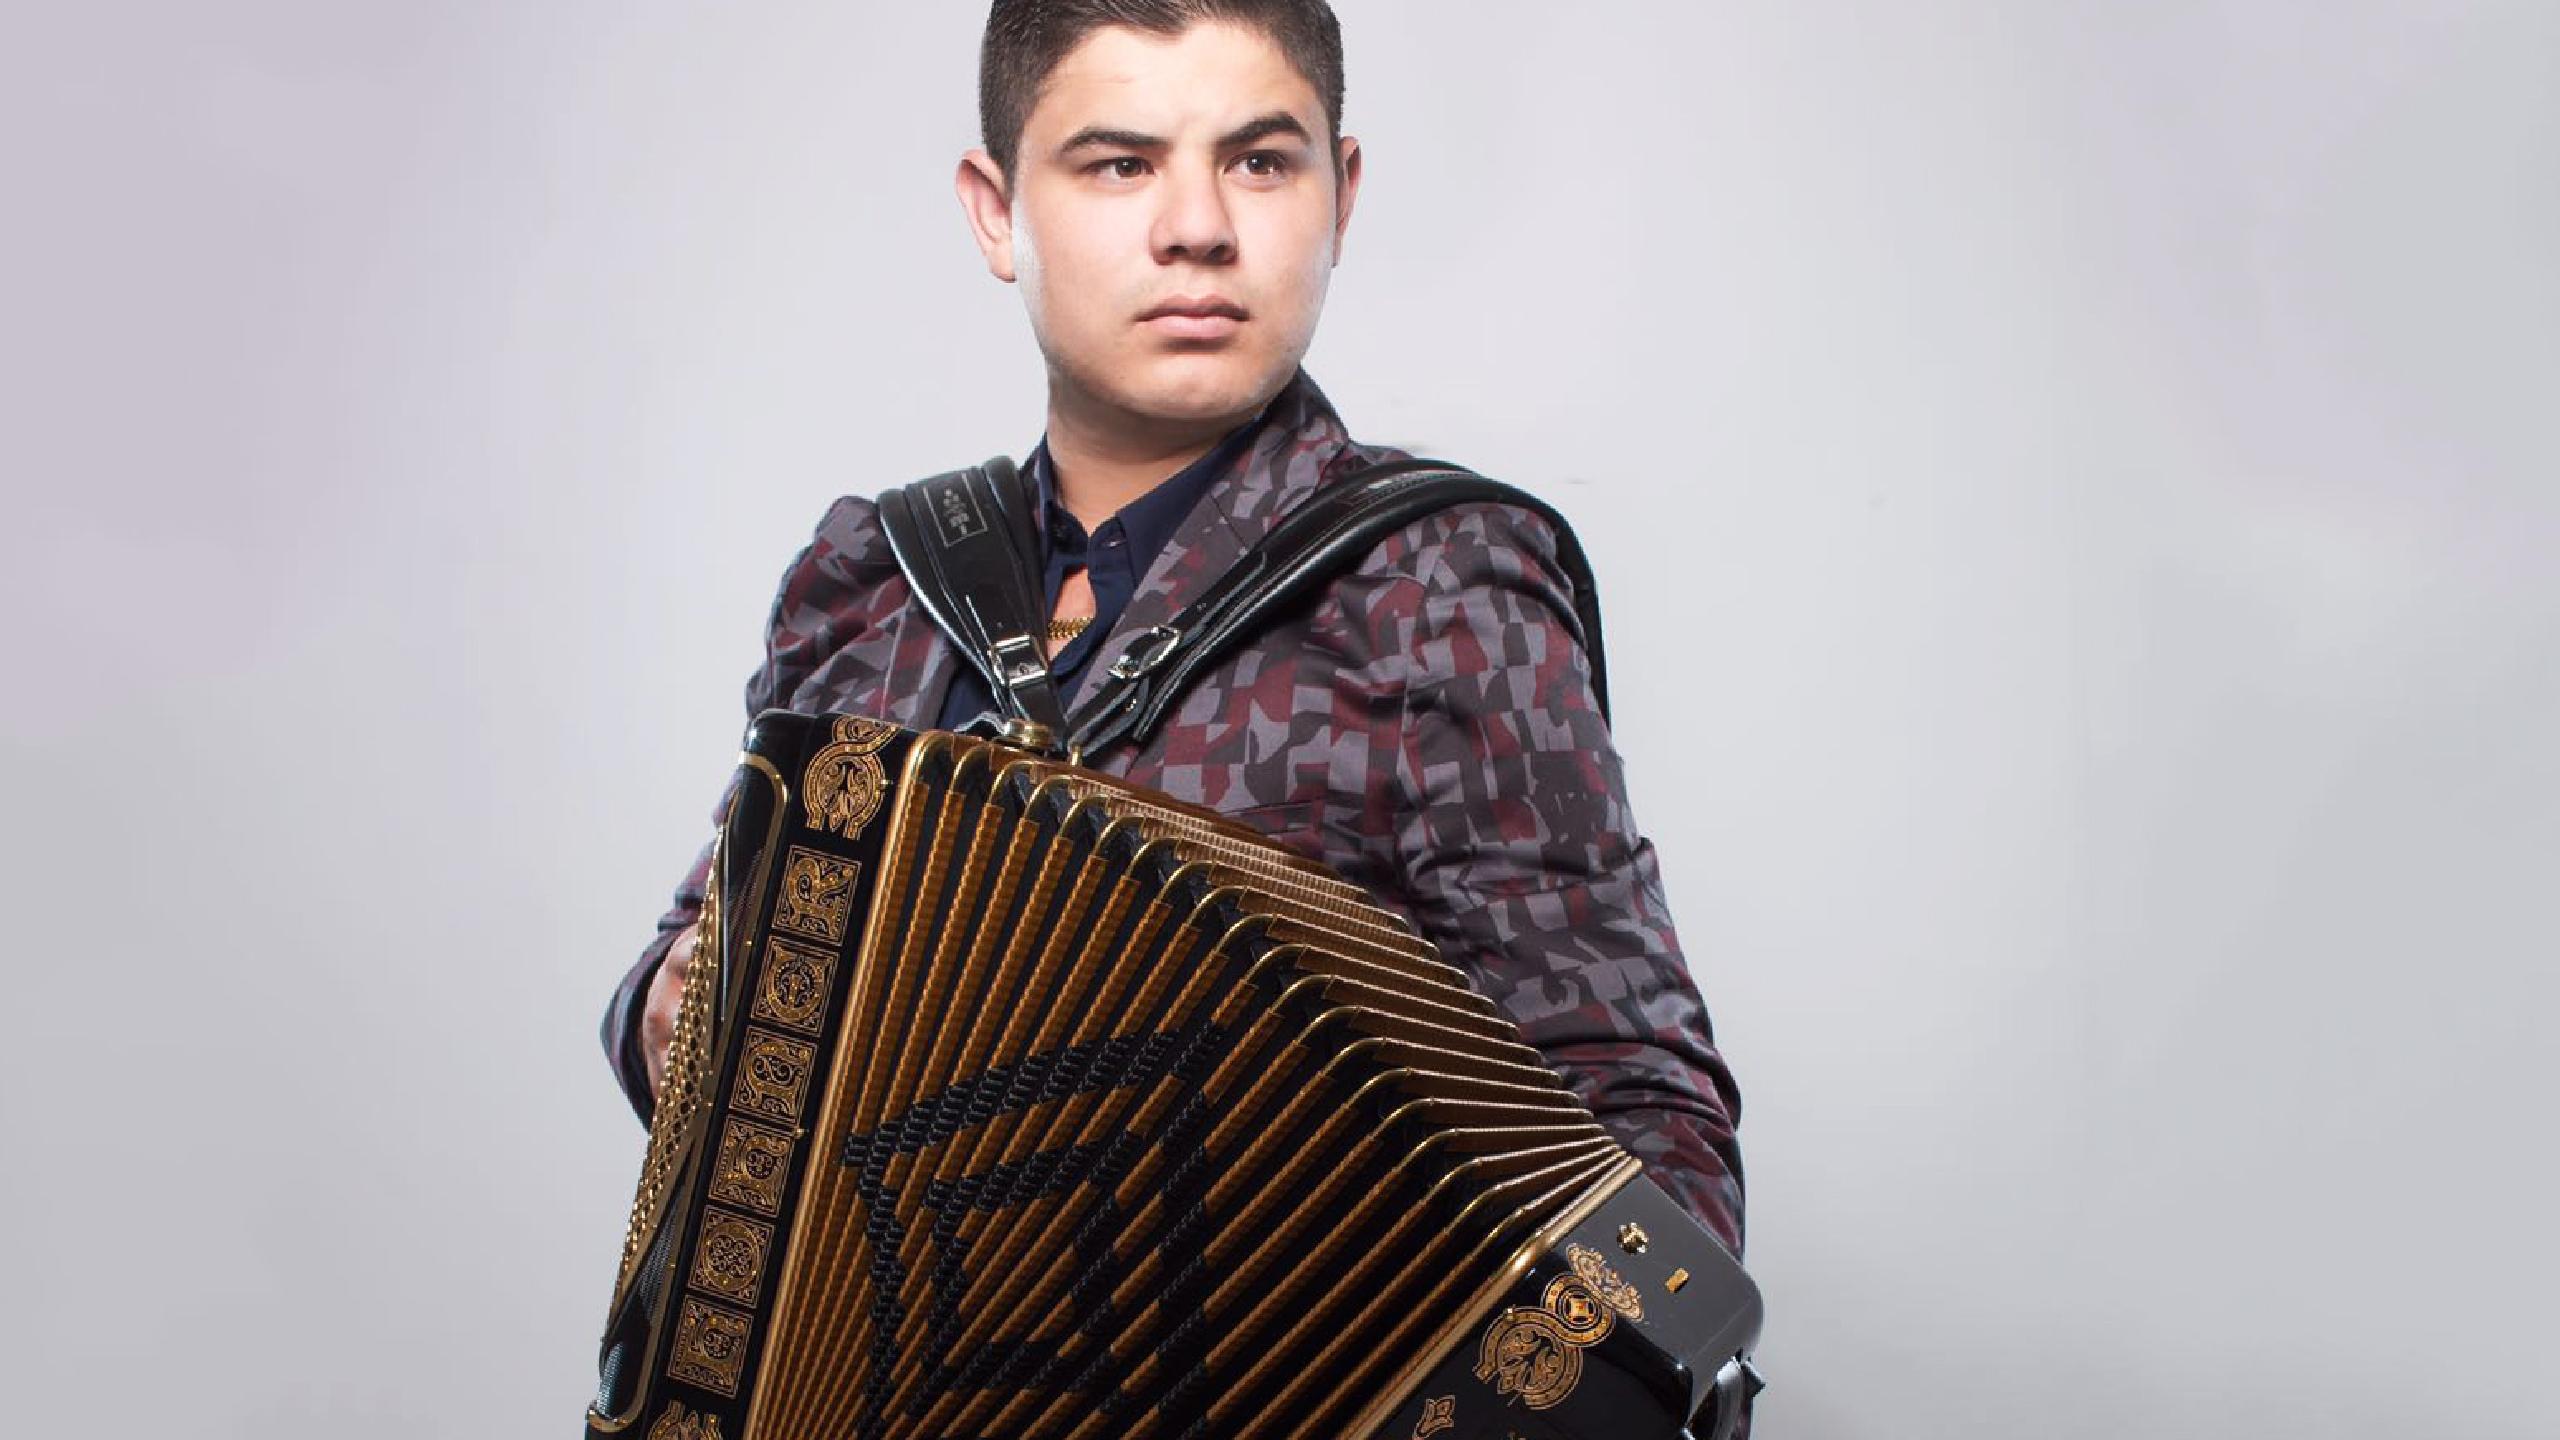 Alfredo Olivas Tour 2020 Alfredo Olivas tour dates 2019 2020. Alfredo Olivas tickets and